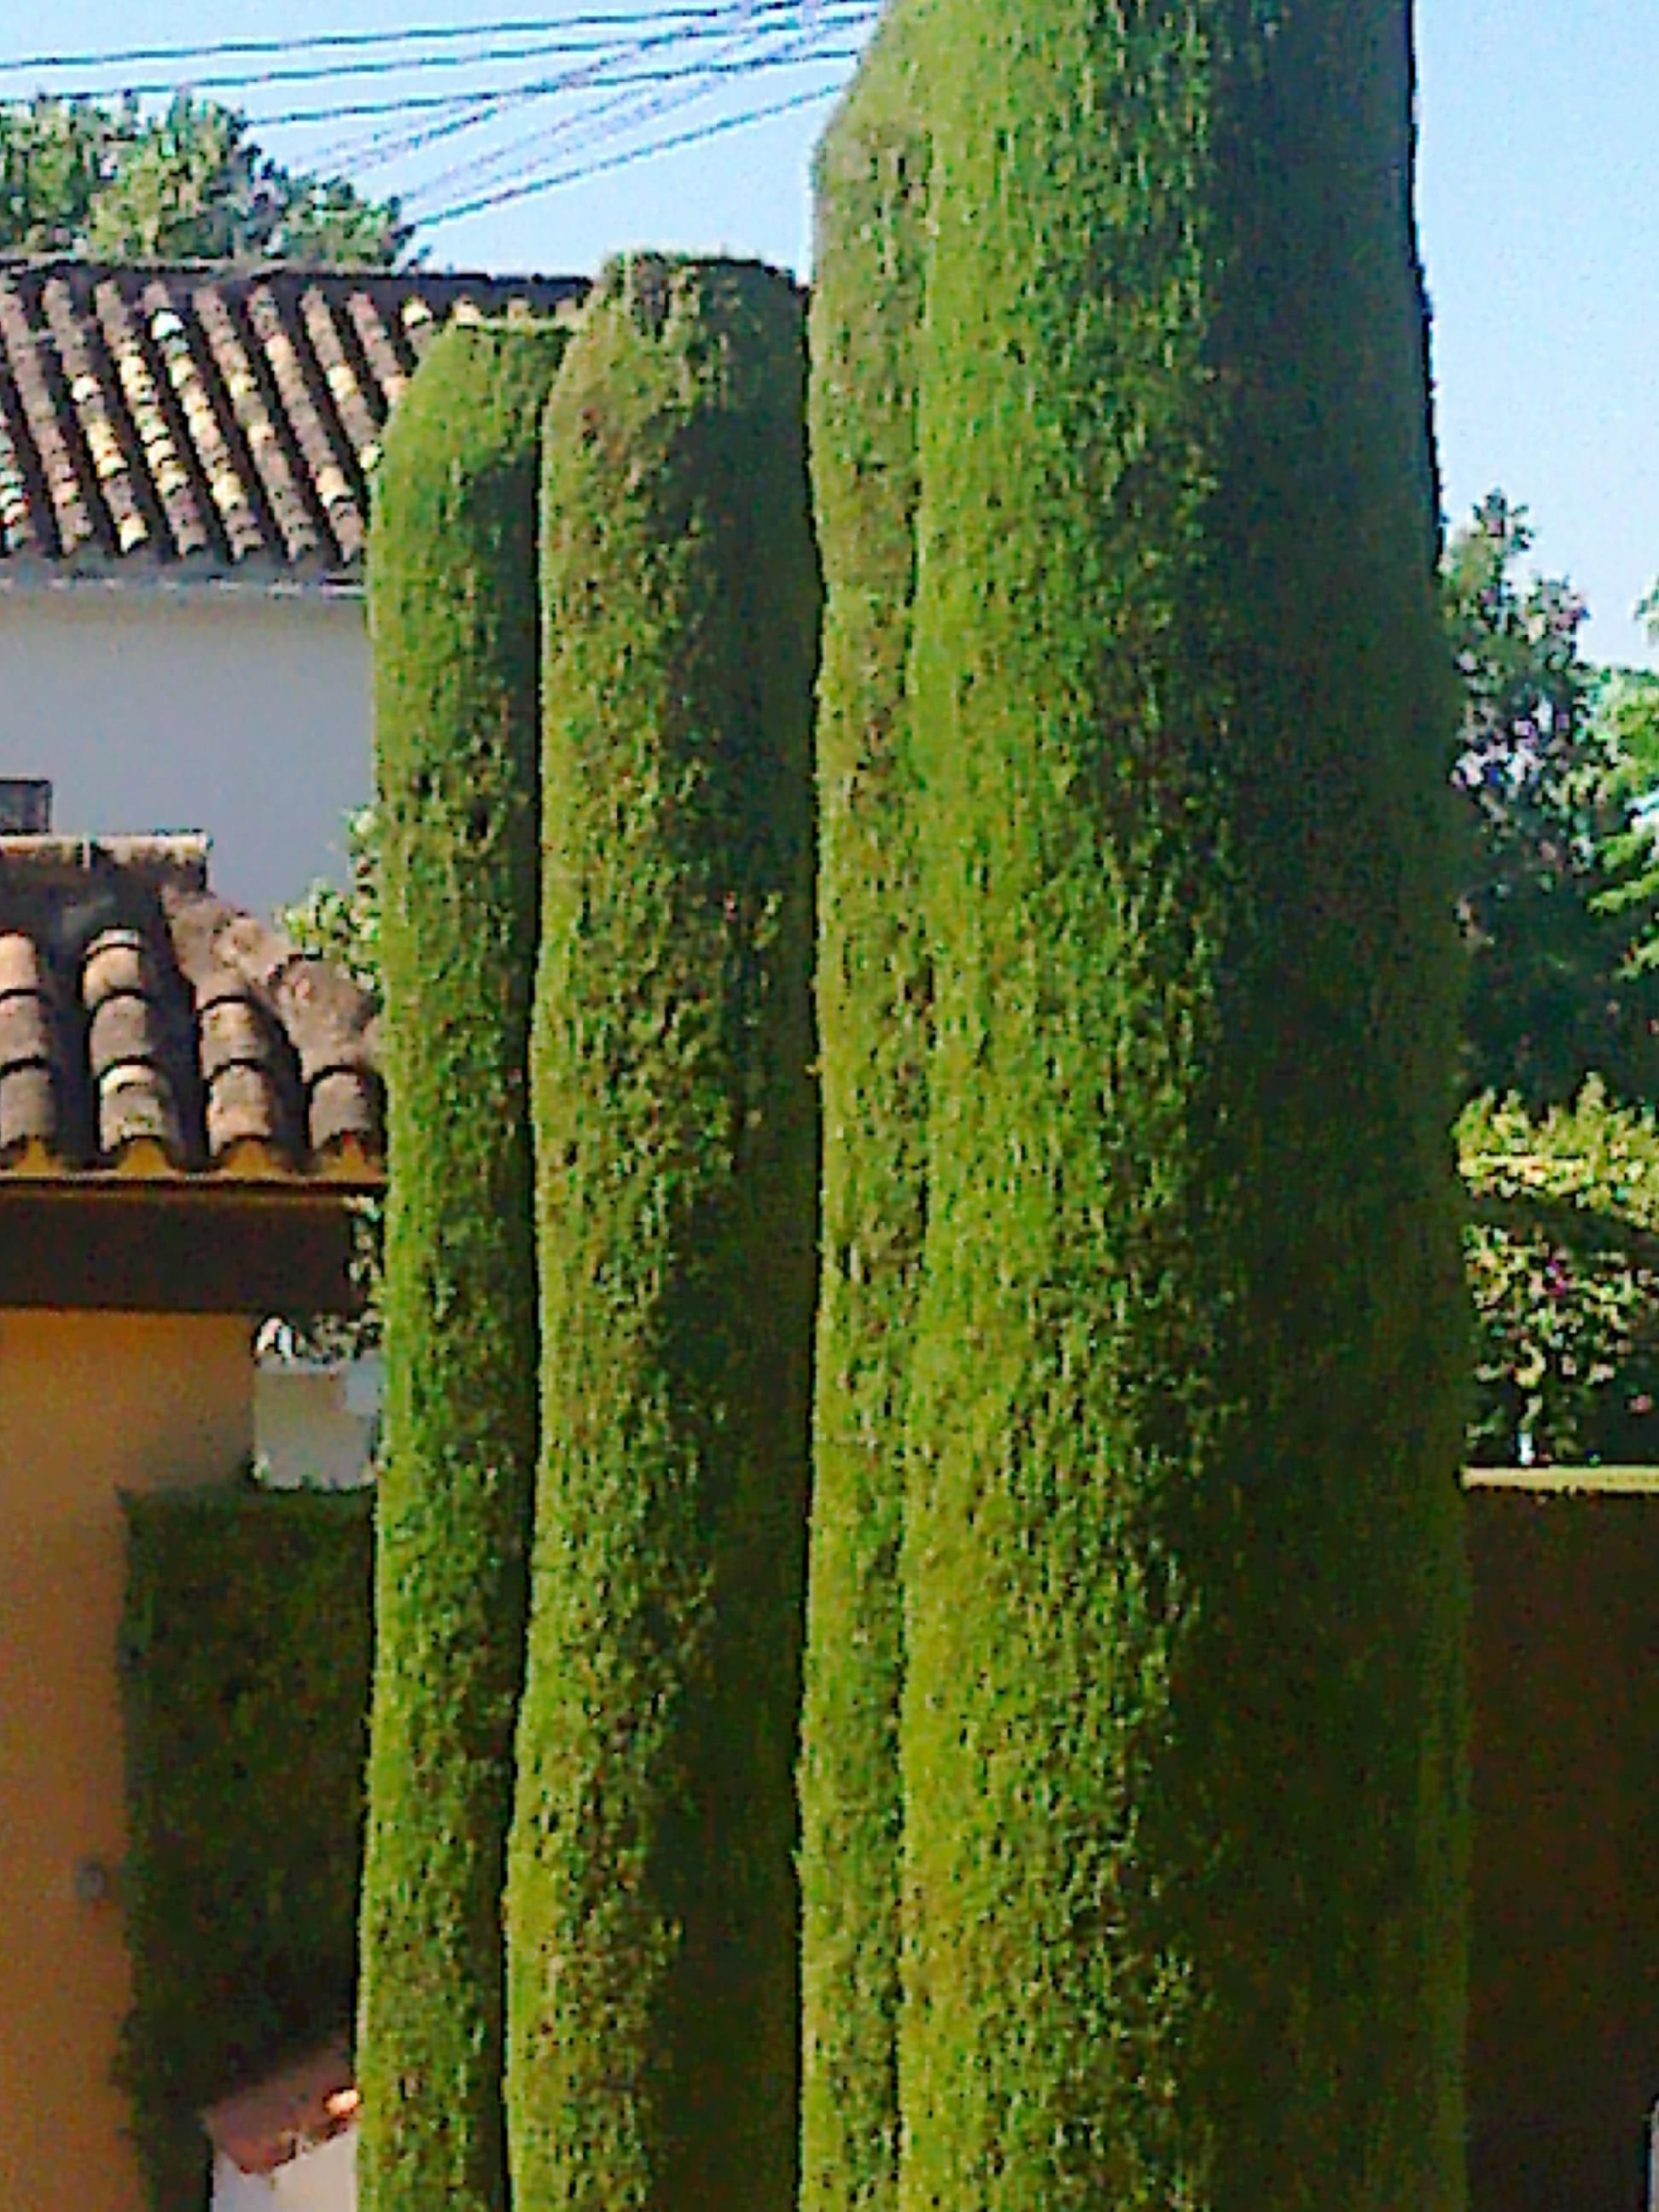 Mantenimiento de jardines jardineria tierra santa for Mantenimiento de jardines